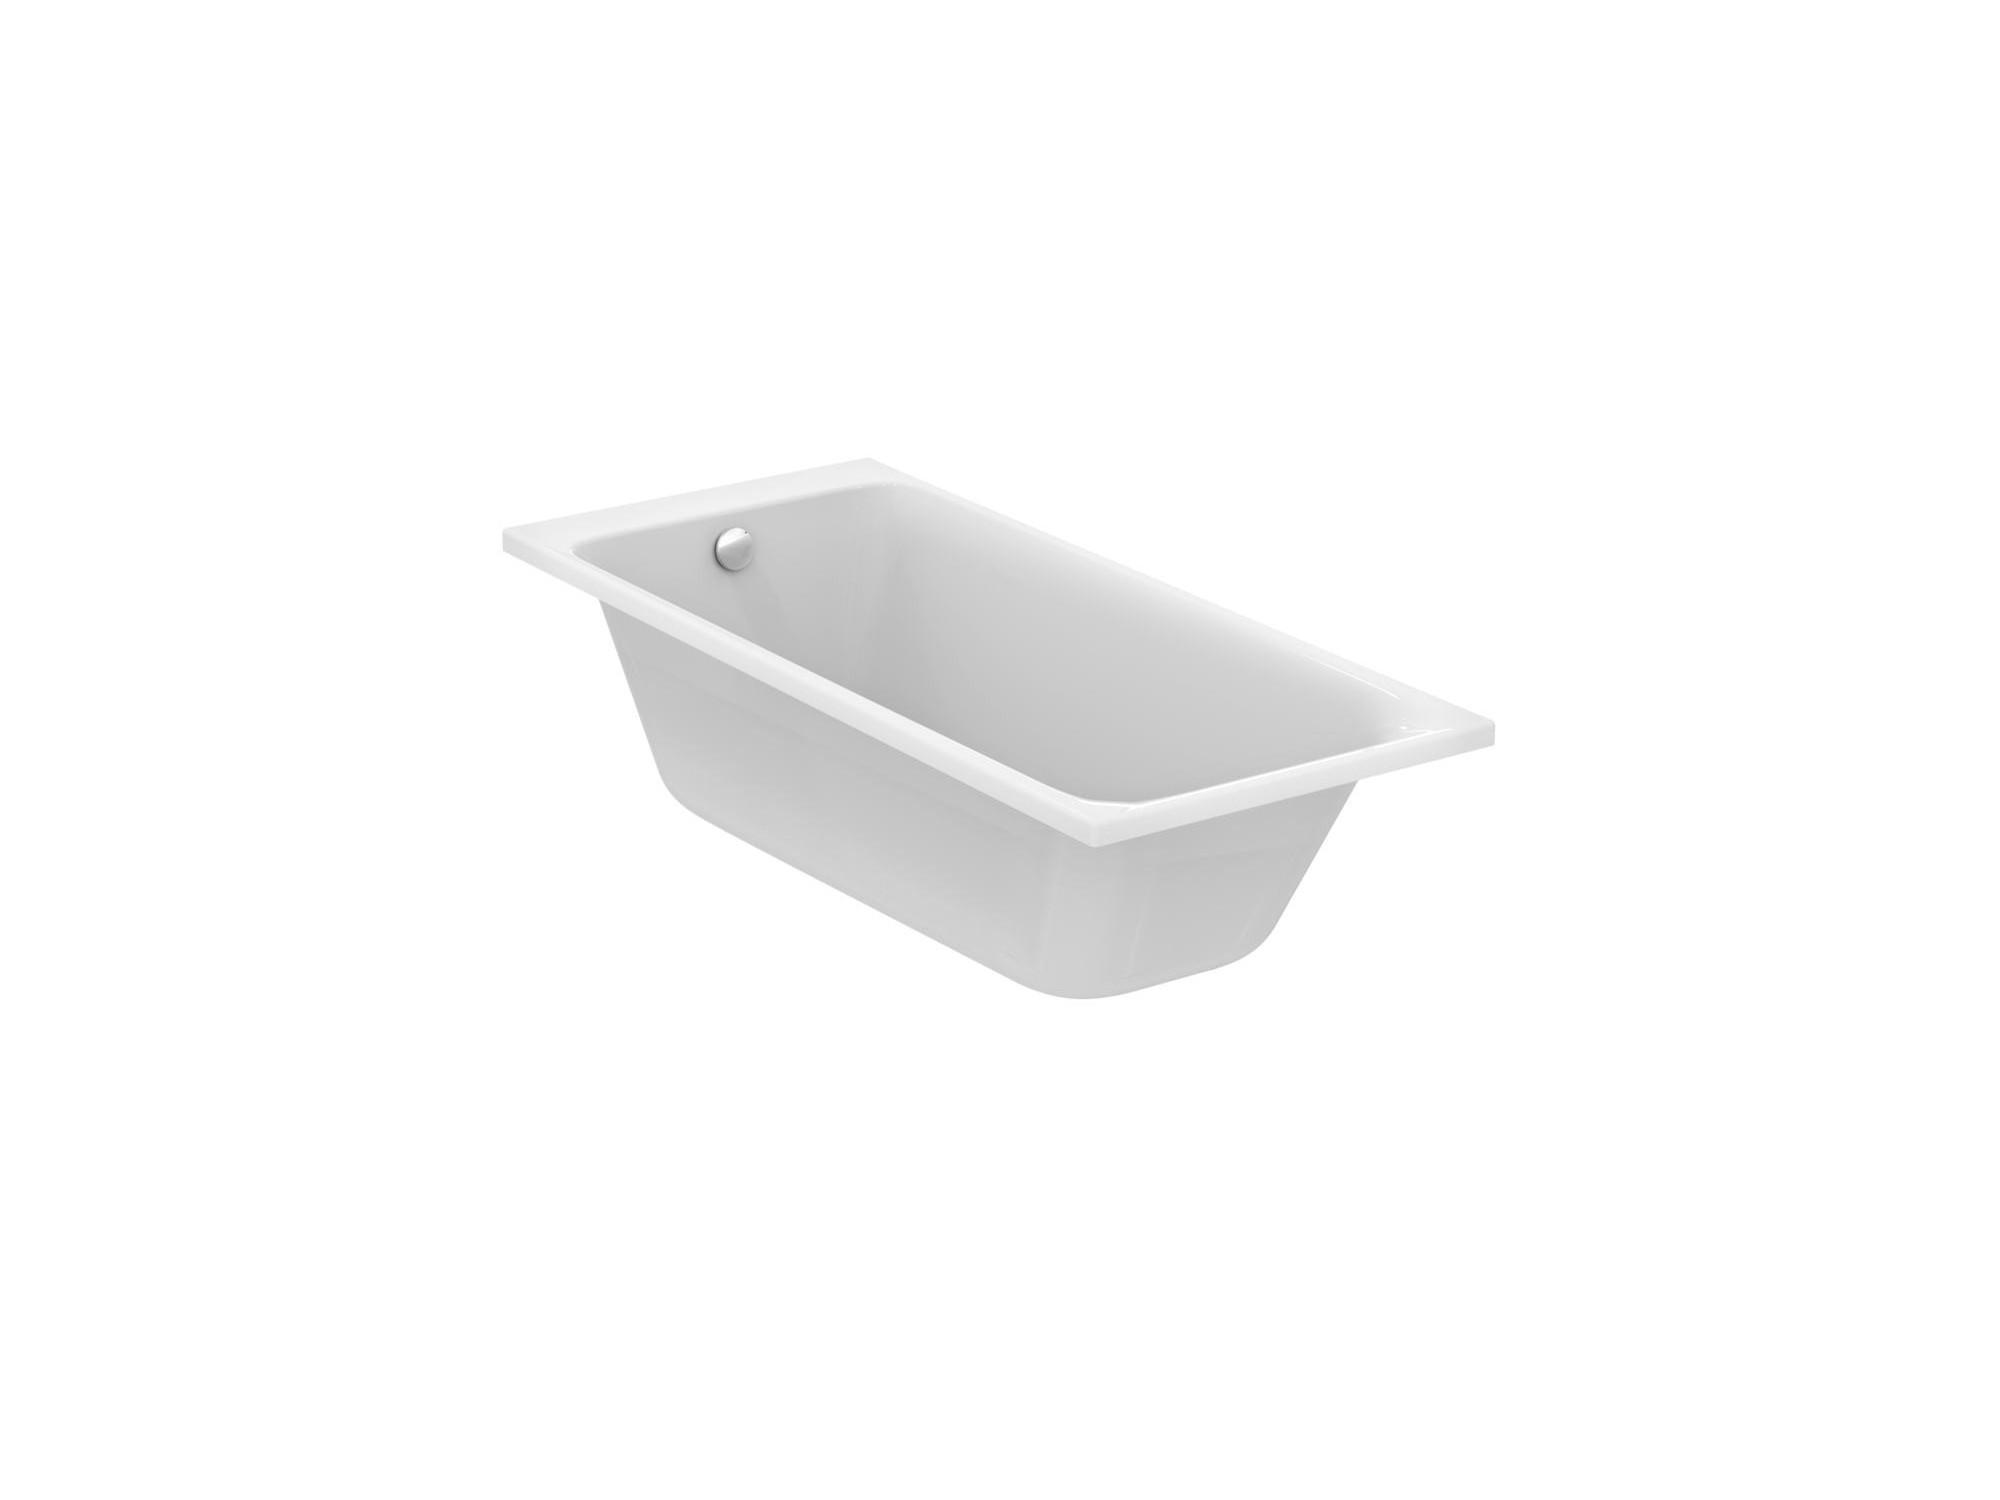 Vasca Da Bagno Misure Standard vasca da bagno ad incasso asimmetrica ideal standard